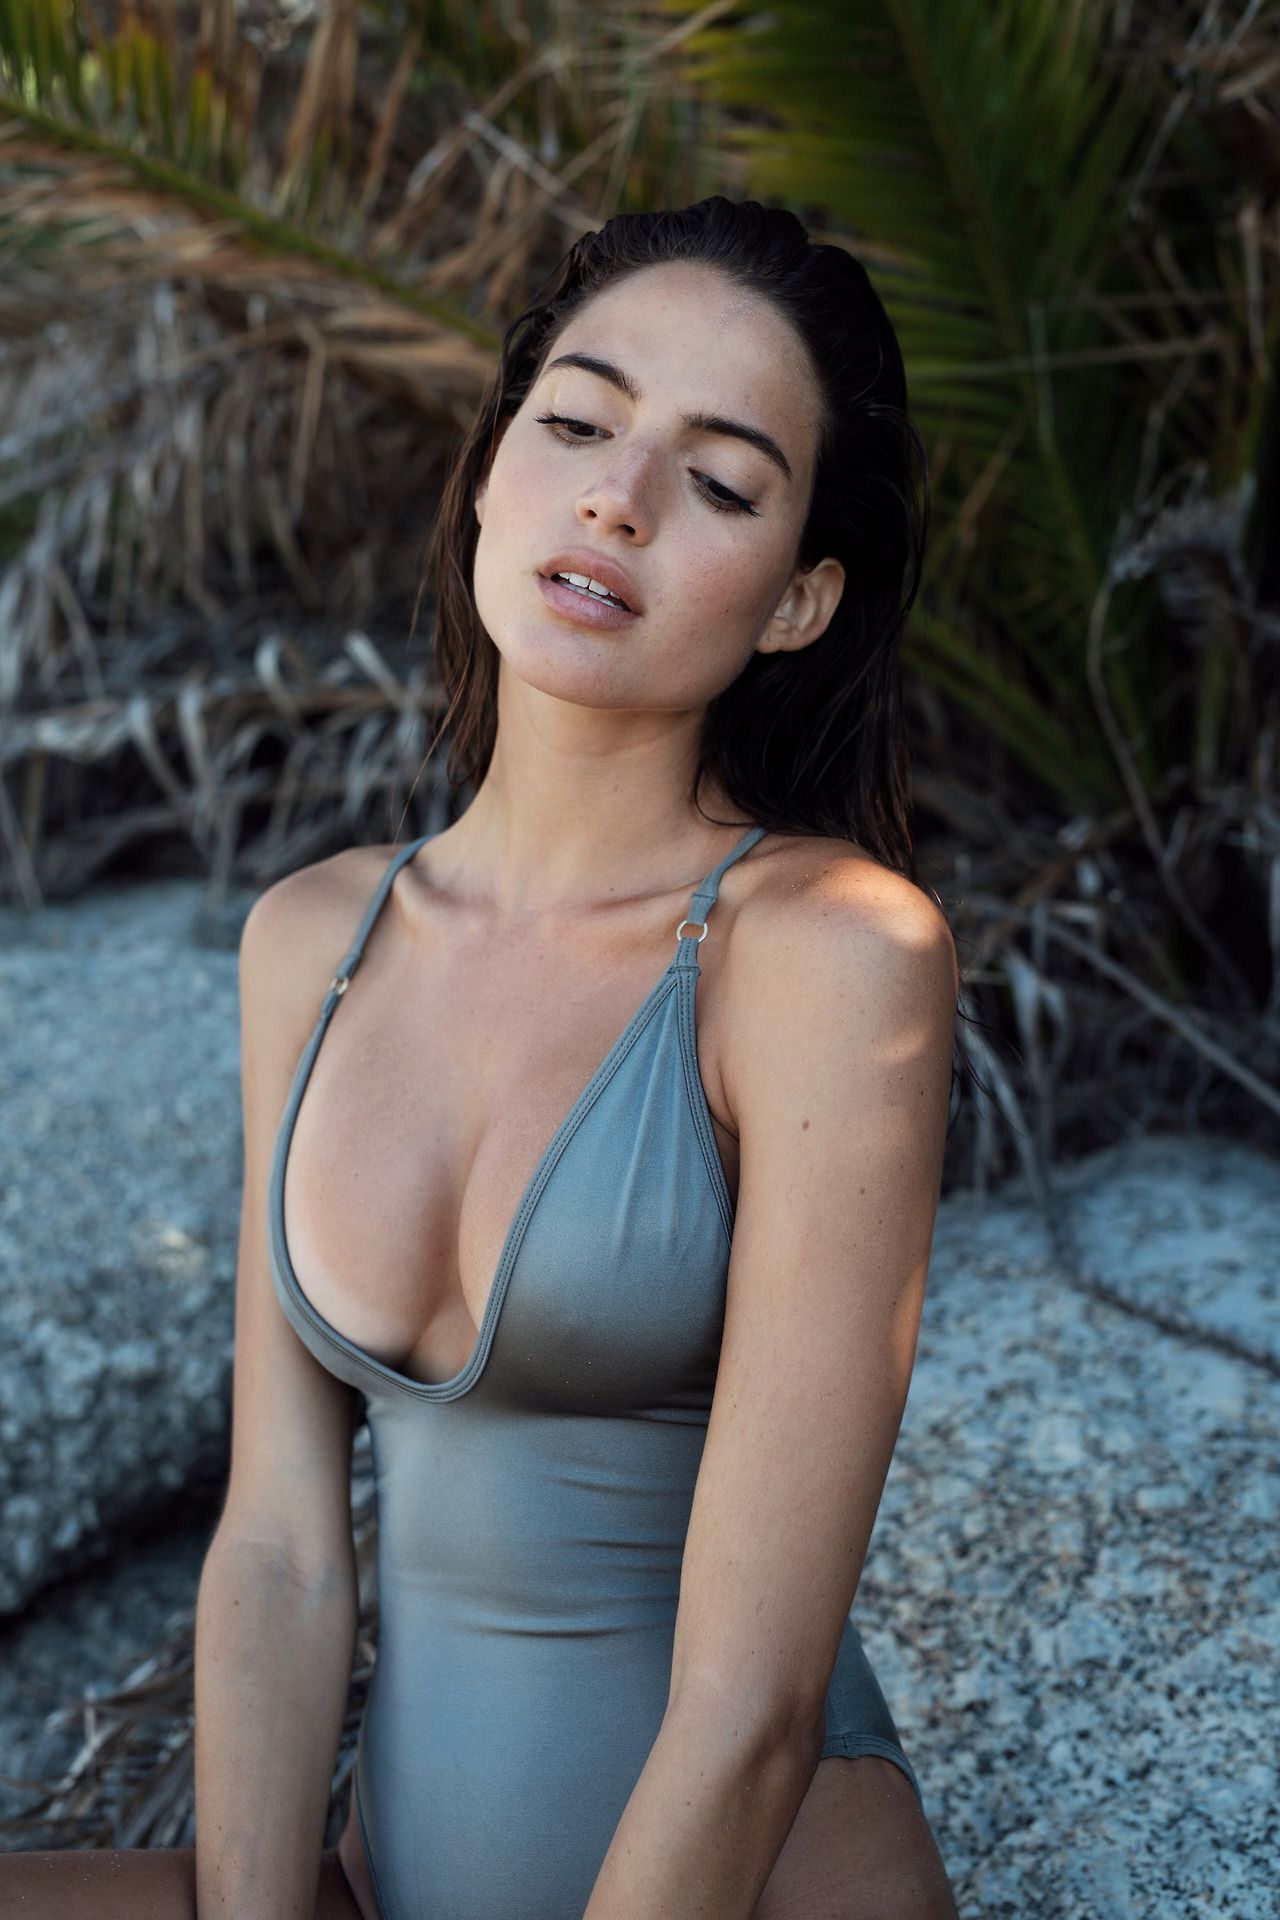 Leaked Rafaella Consentino nude photos 2019